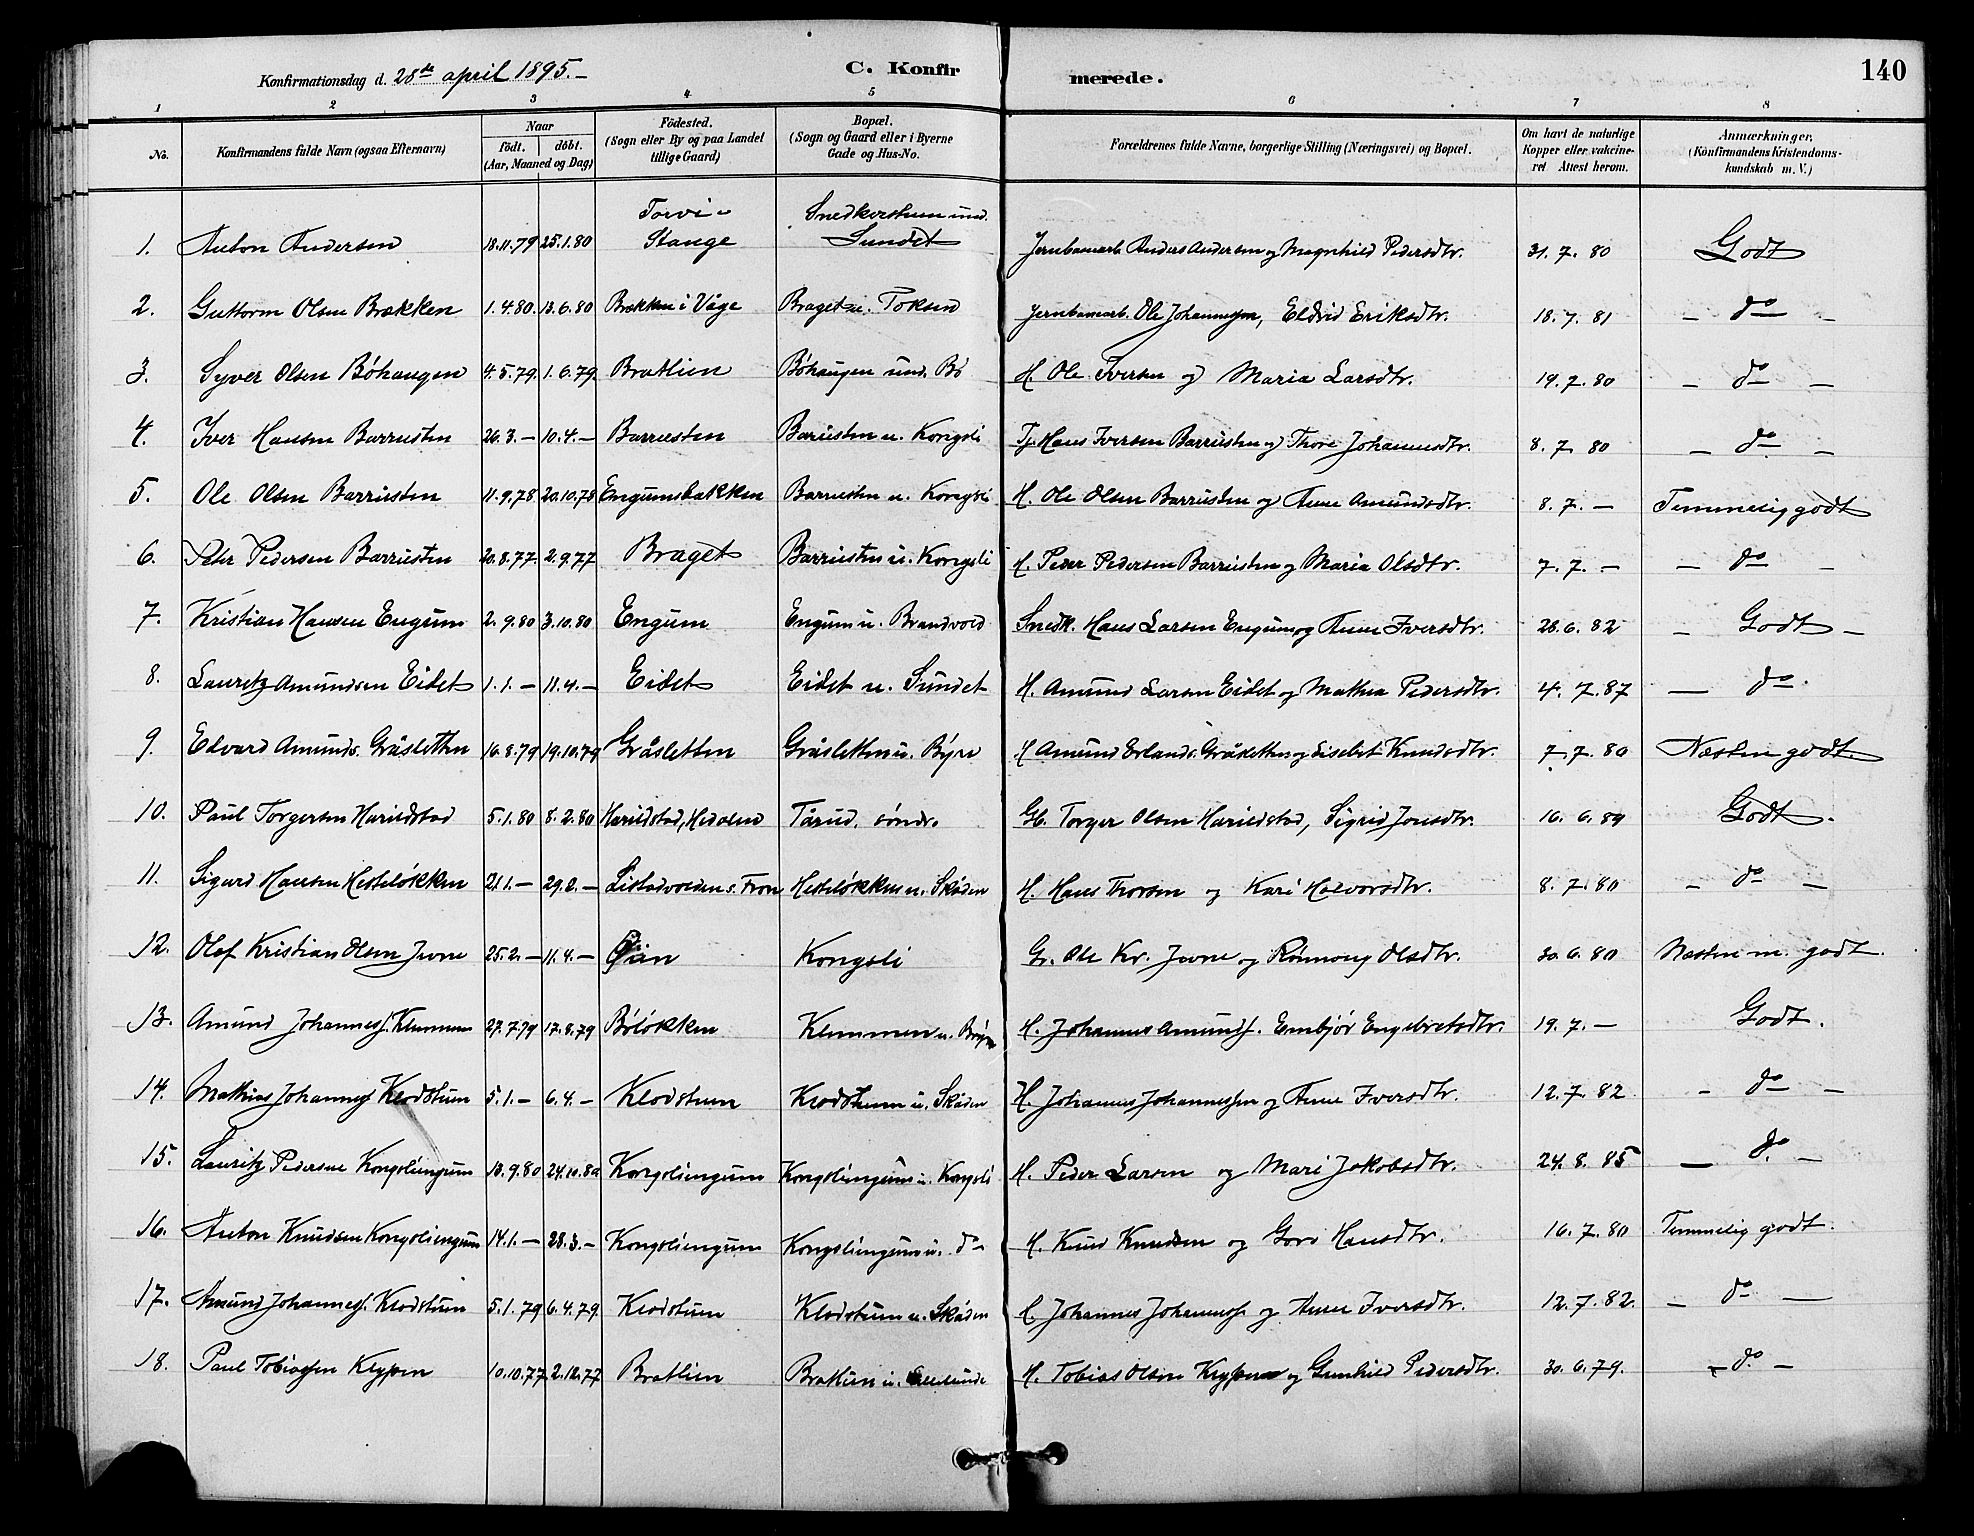 SAH, Nord-Fron prestekontor, Klokkerbok nr. 4, 1884-1914, s. 140